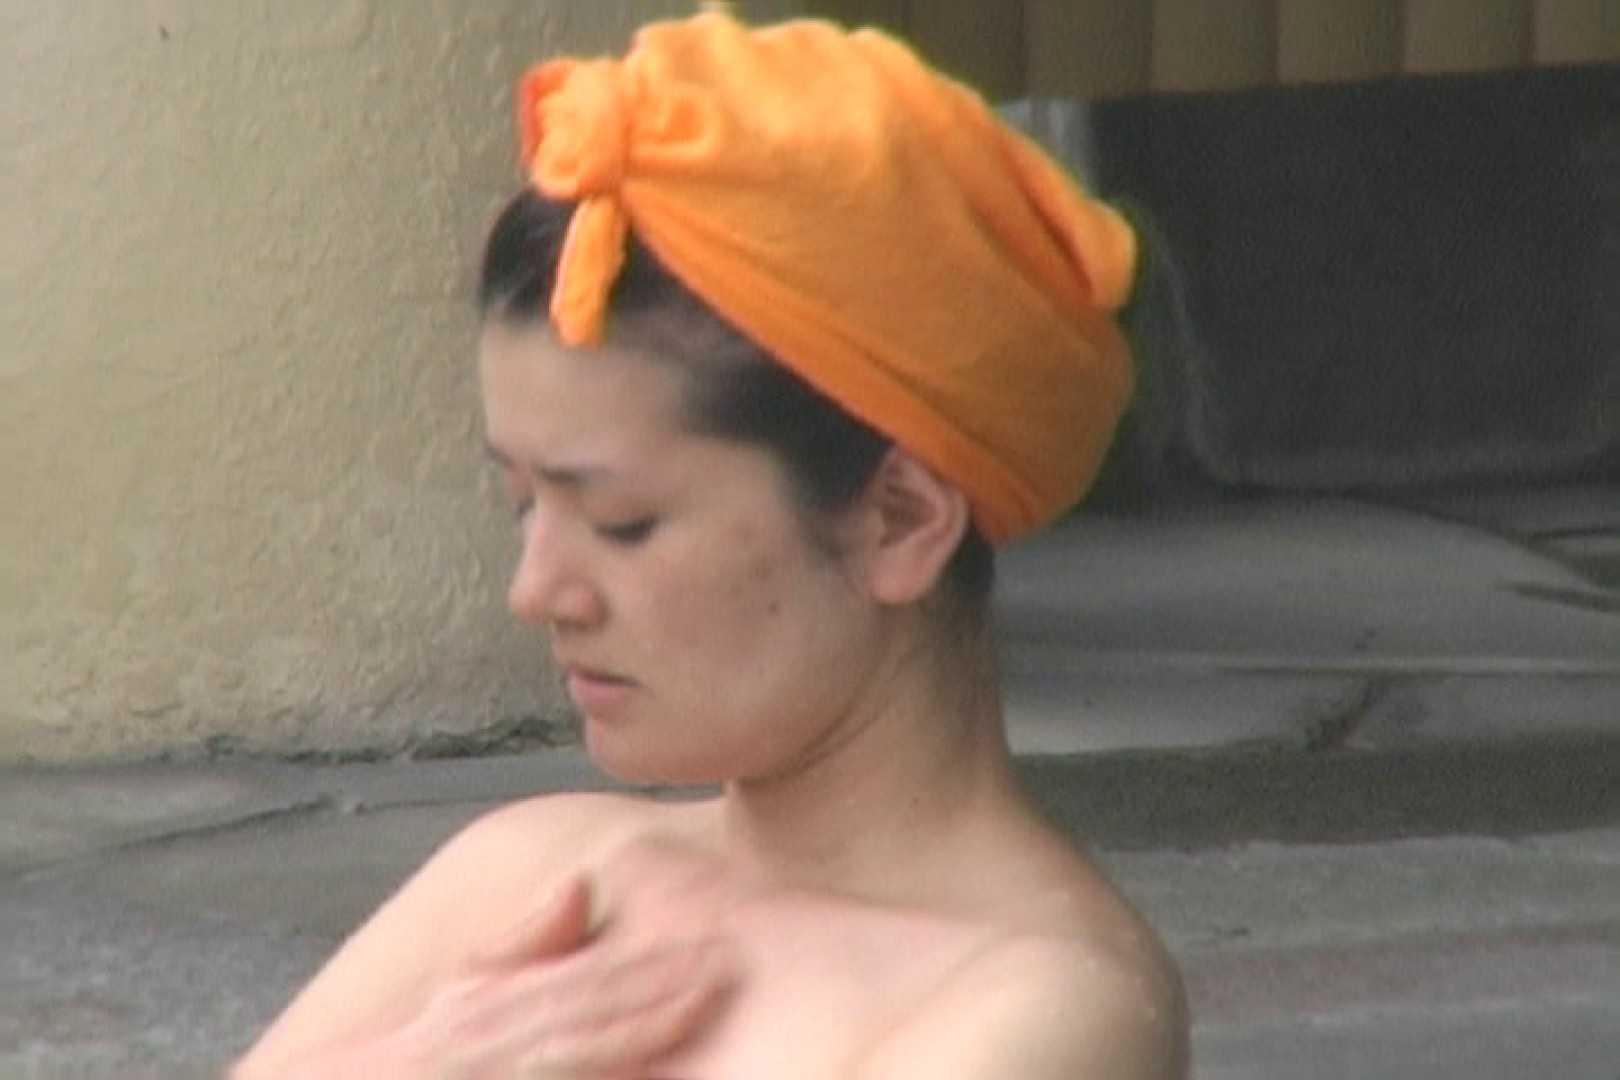 Aquaな露天風呂Vol.640 エッチな盗撮 セックス画像 101pic 46